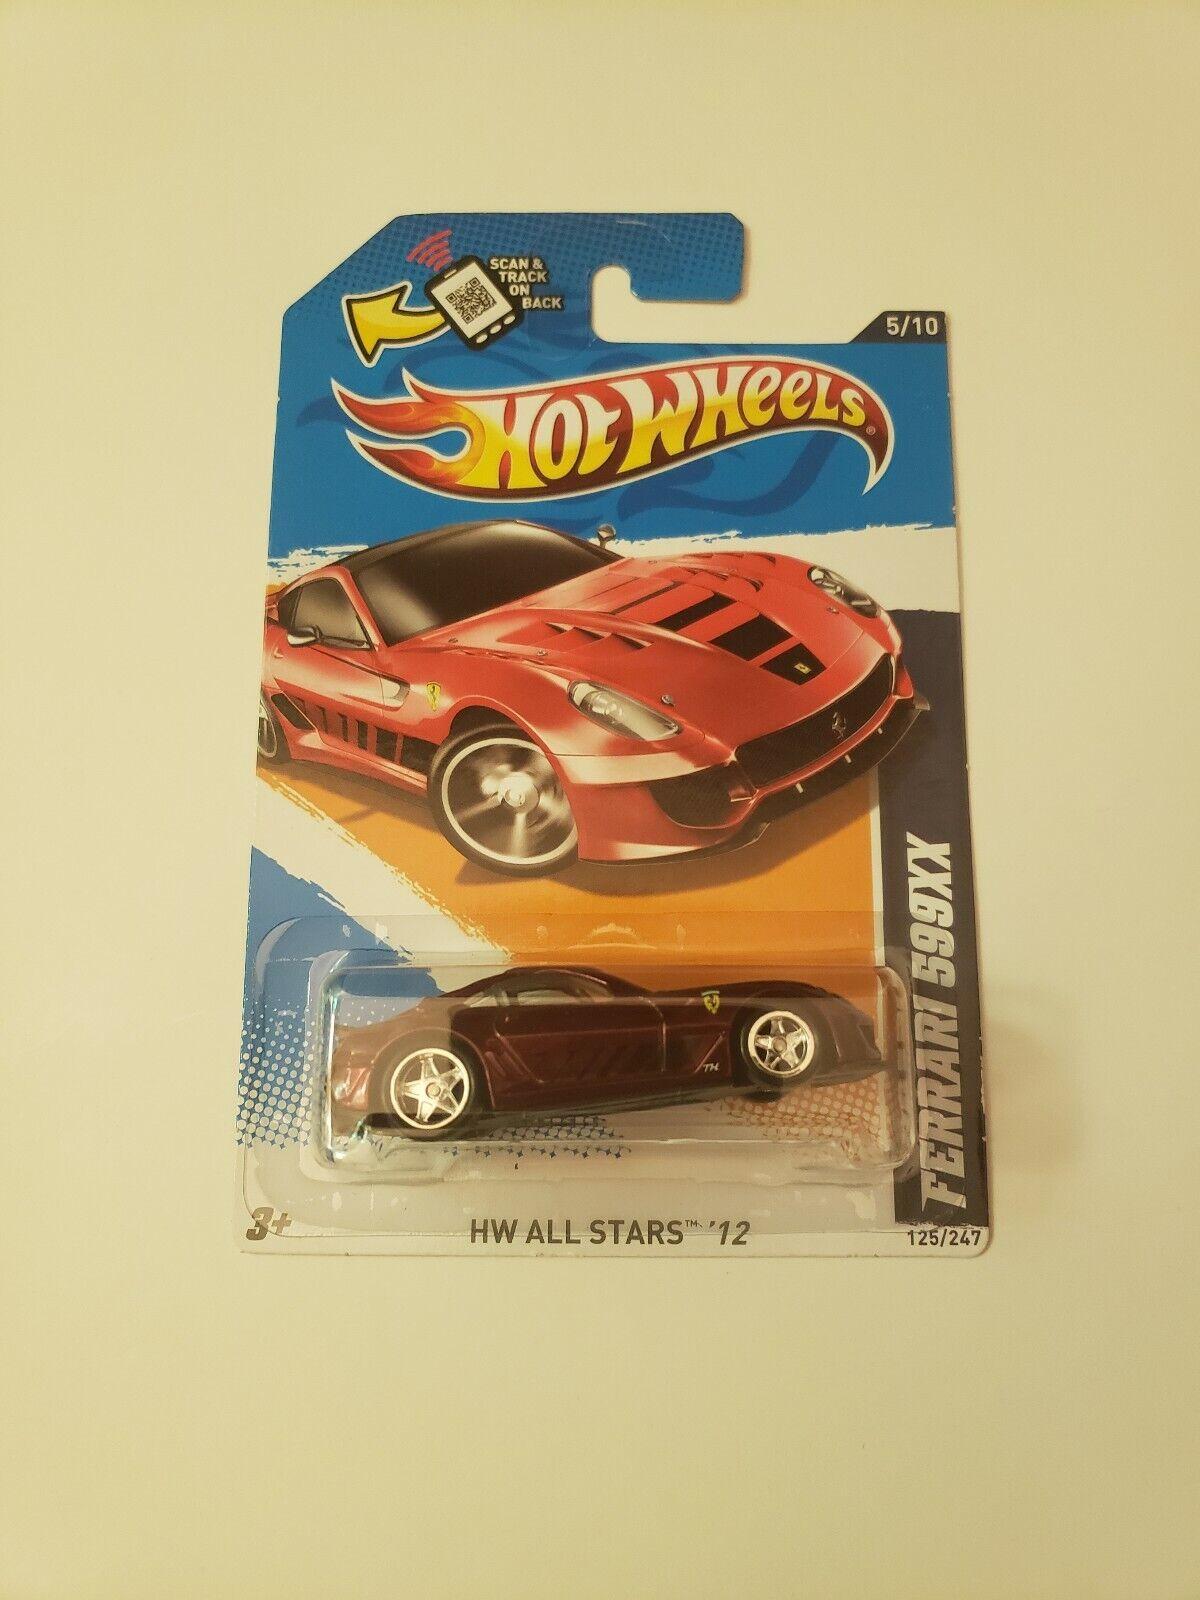 Hot Wheels 2 súper Búsqueda del Tesoro-Ferrari 599XX HW All Estrellas'12 y taller de Hardware